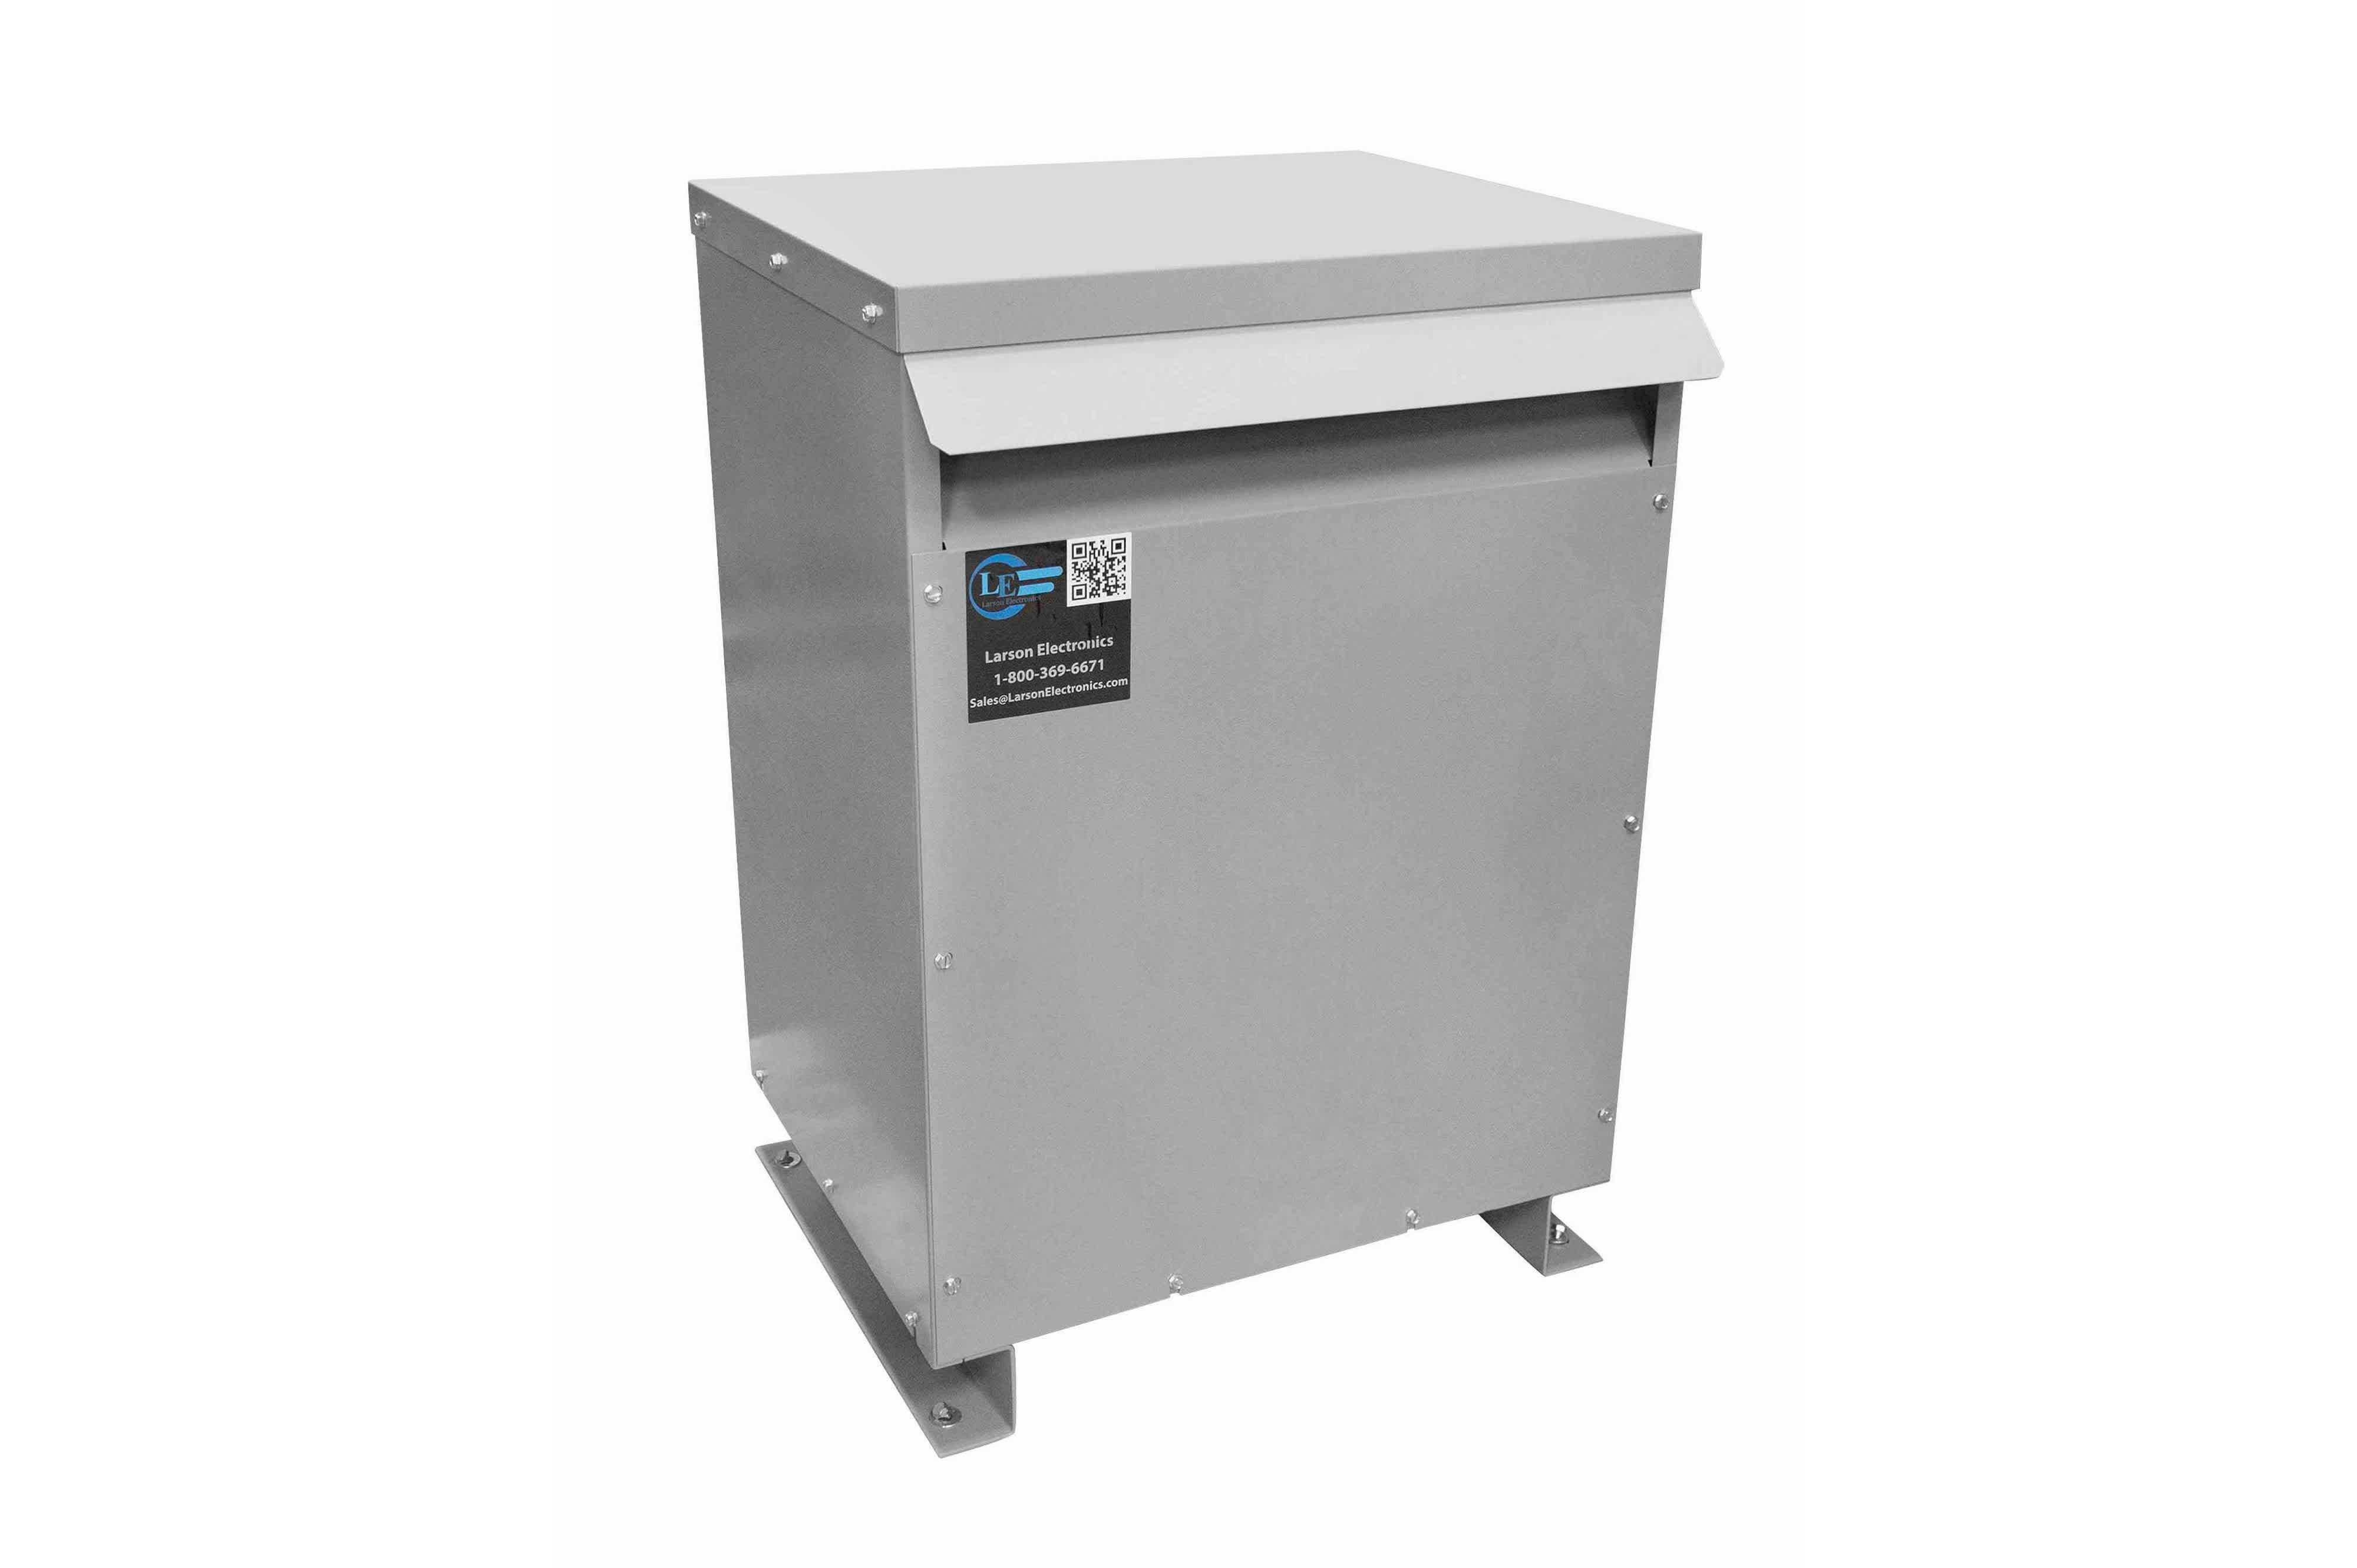 27 kVA 3PH Isolation Transformer, 480V Wye Primary, 400V Delta Secondary, N3R, Ventilated, 60 Hz